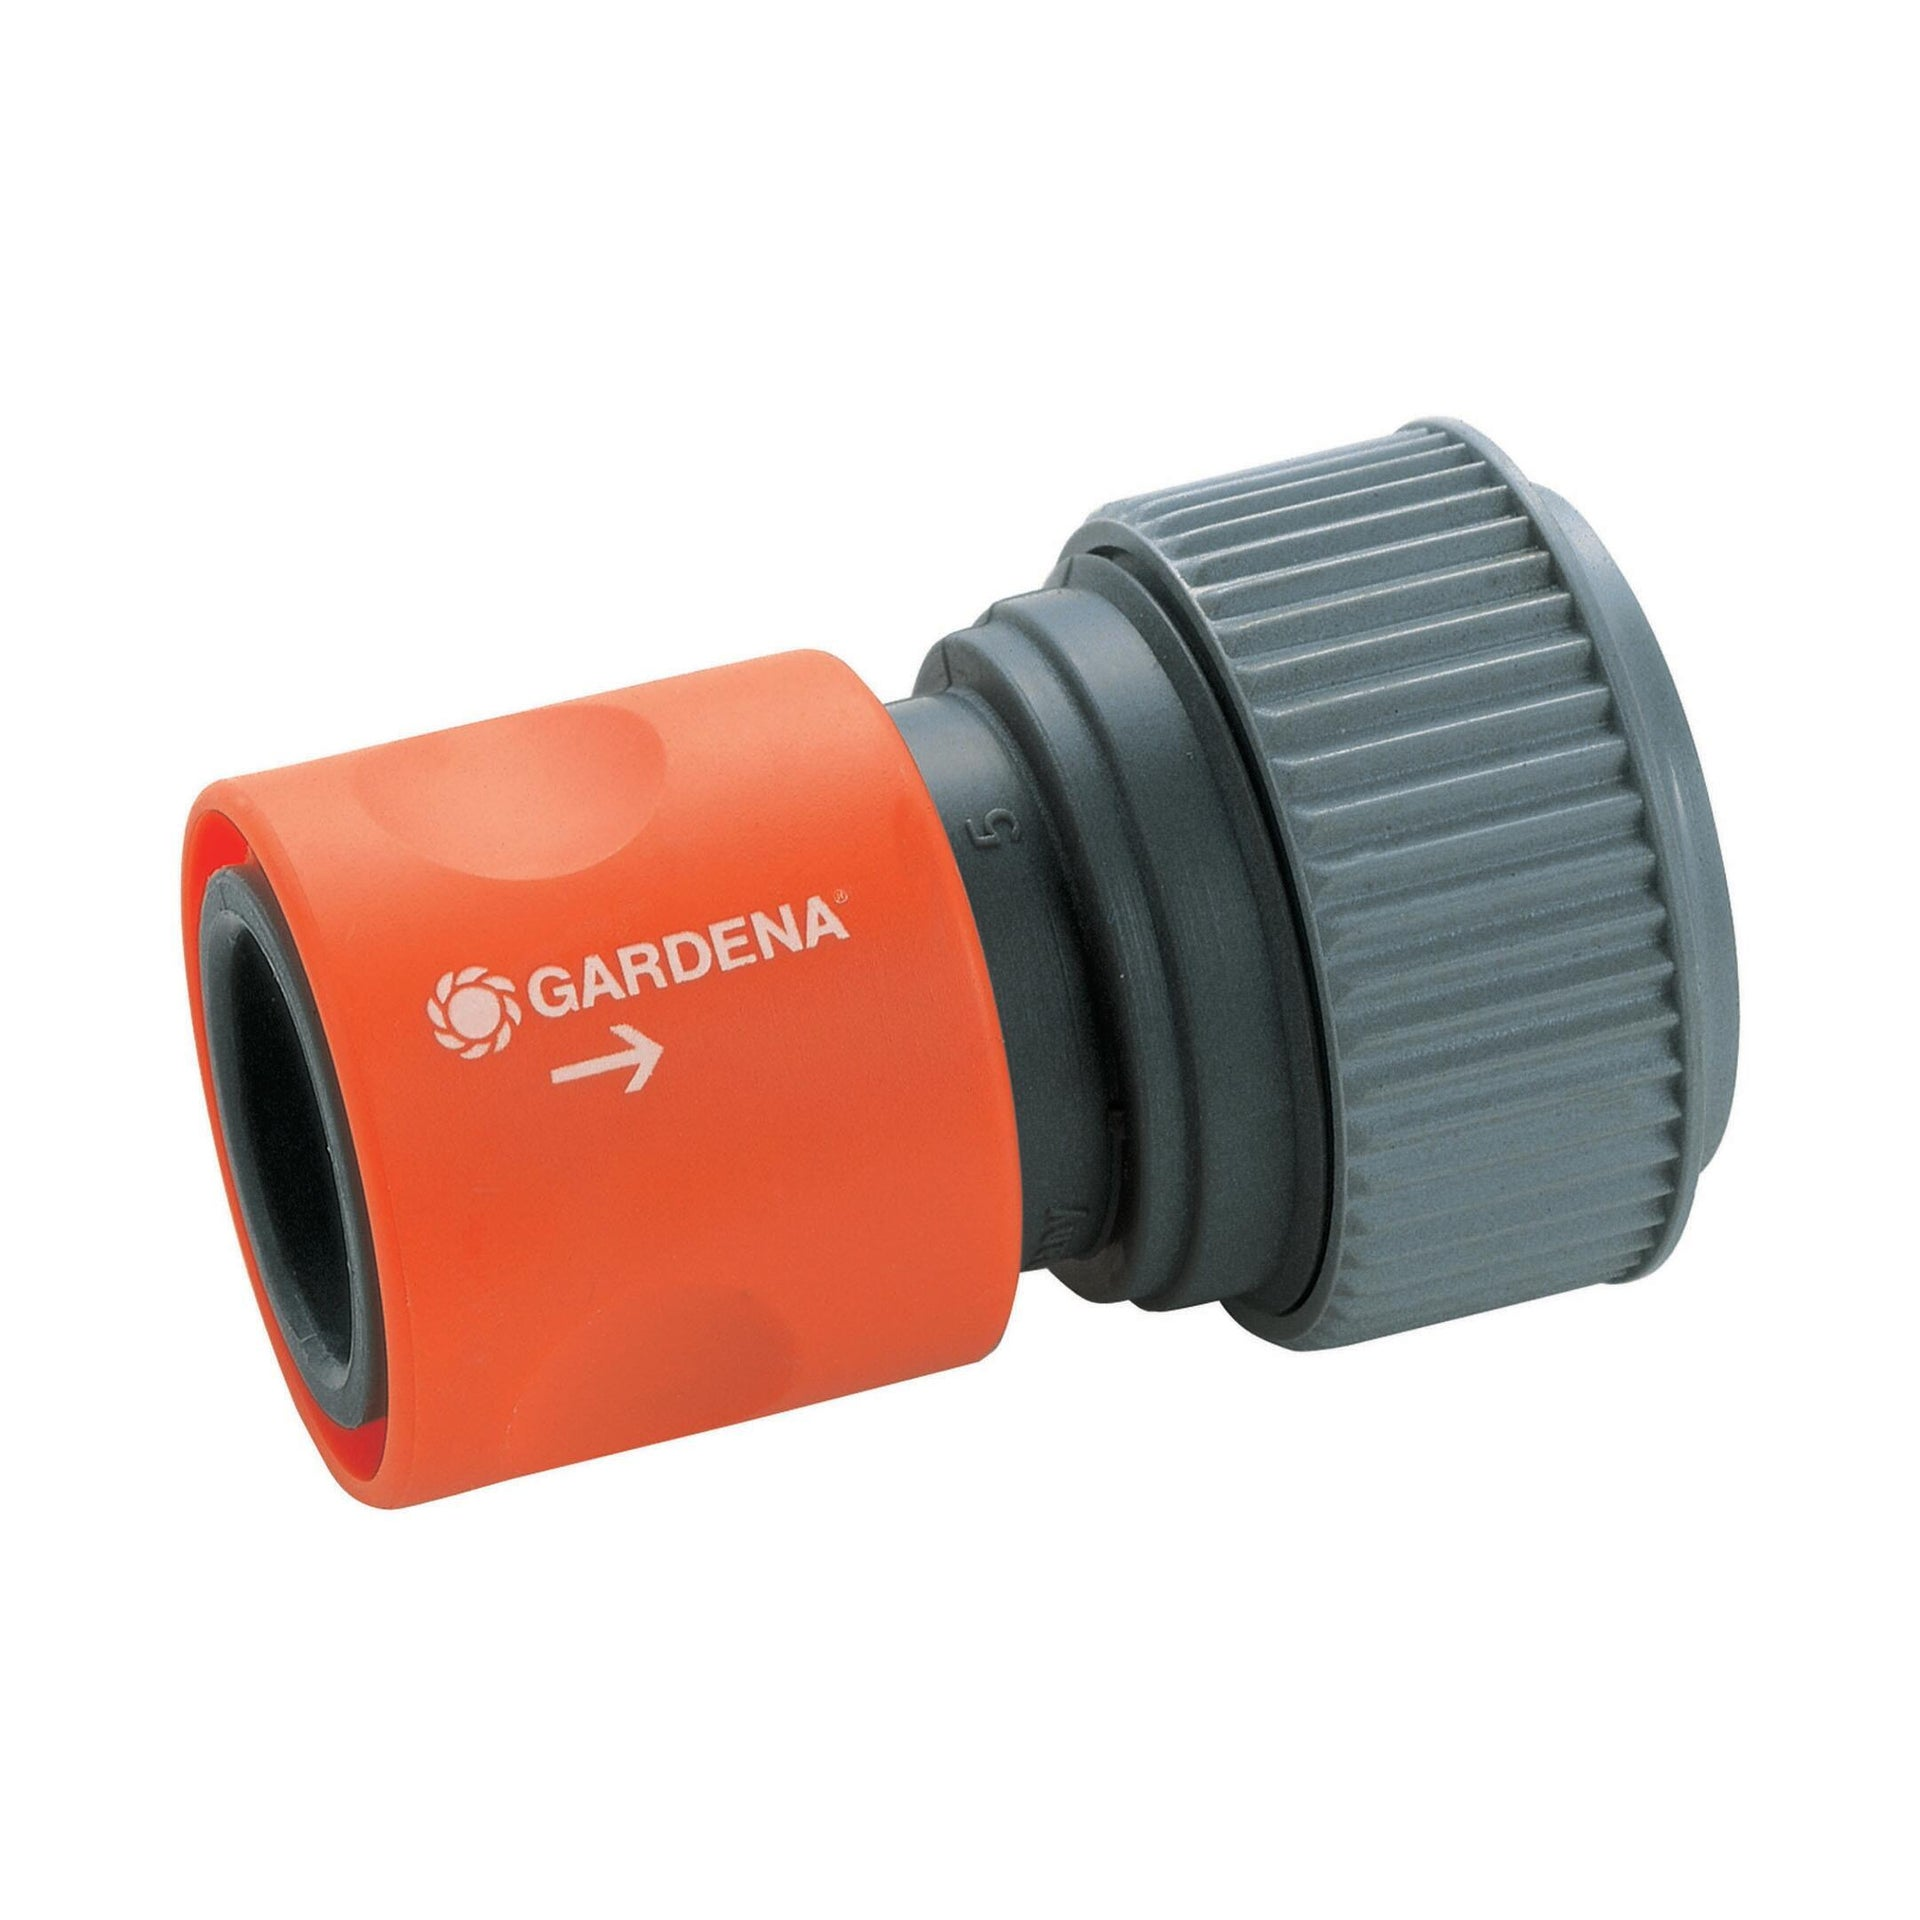 Connettore rapido femmina GARDENA 19 mm - 1